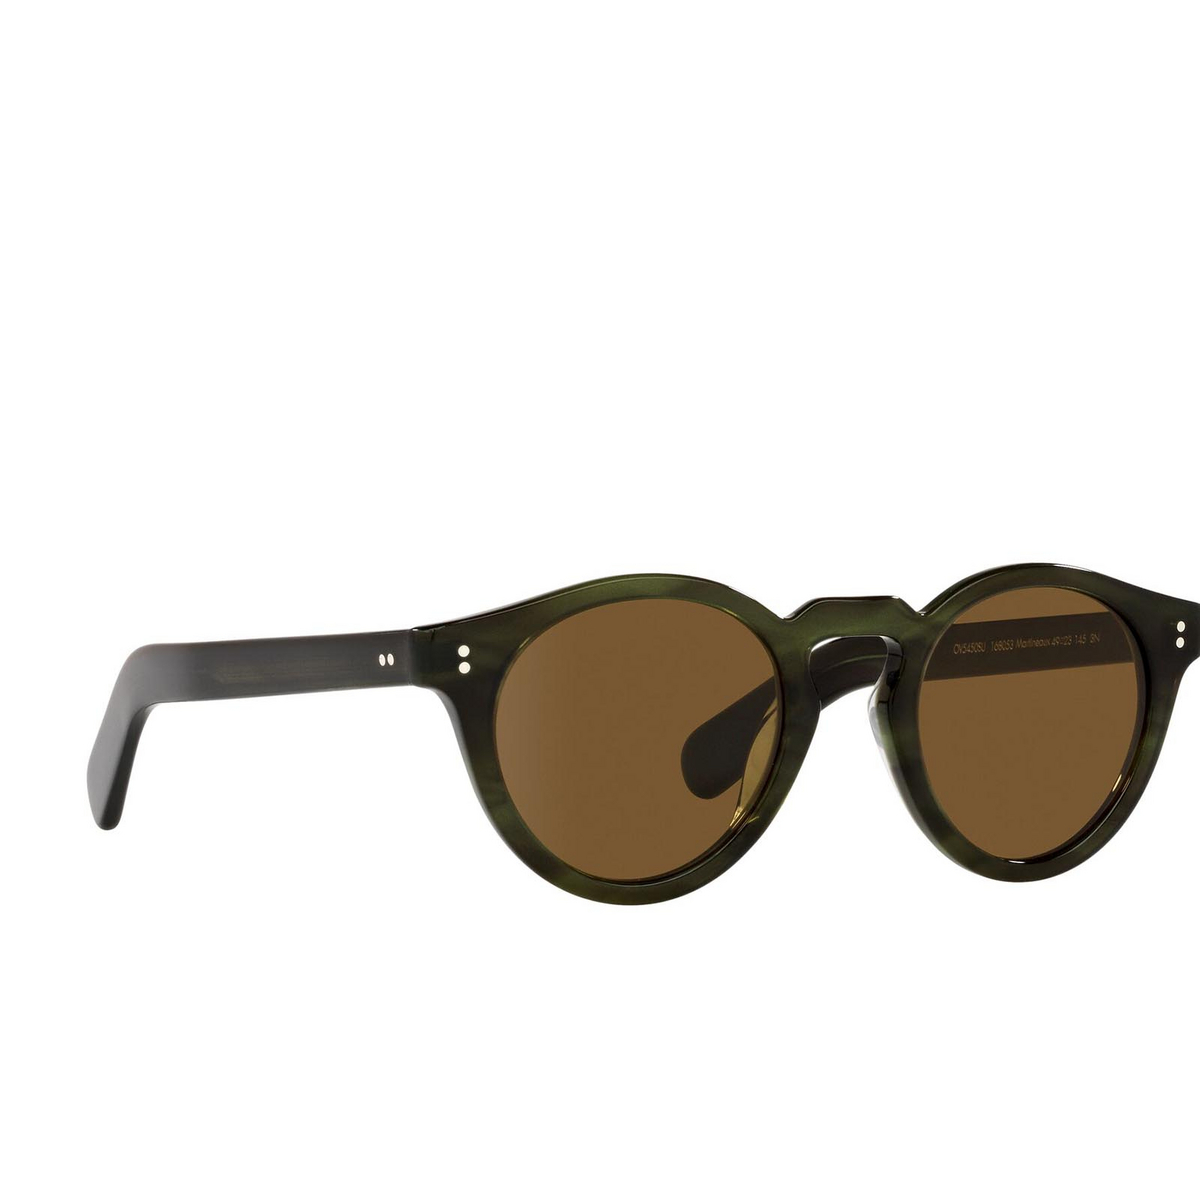 Oliver Peoples® Round Sunglasses: Martineaux OV5450SU color Emerald Bark 168053 - three-quarters view.